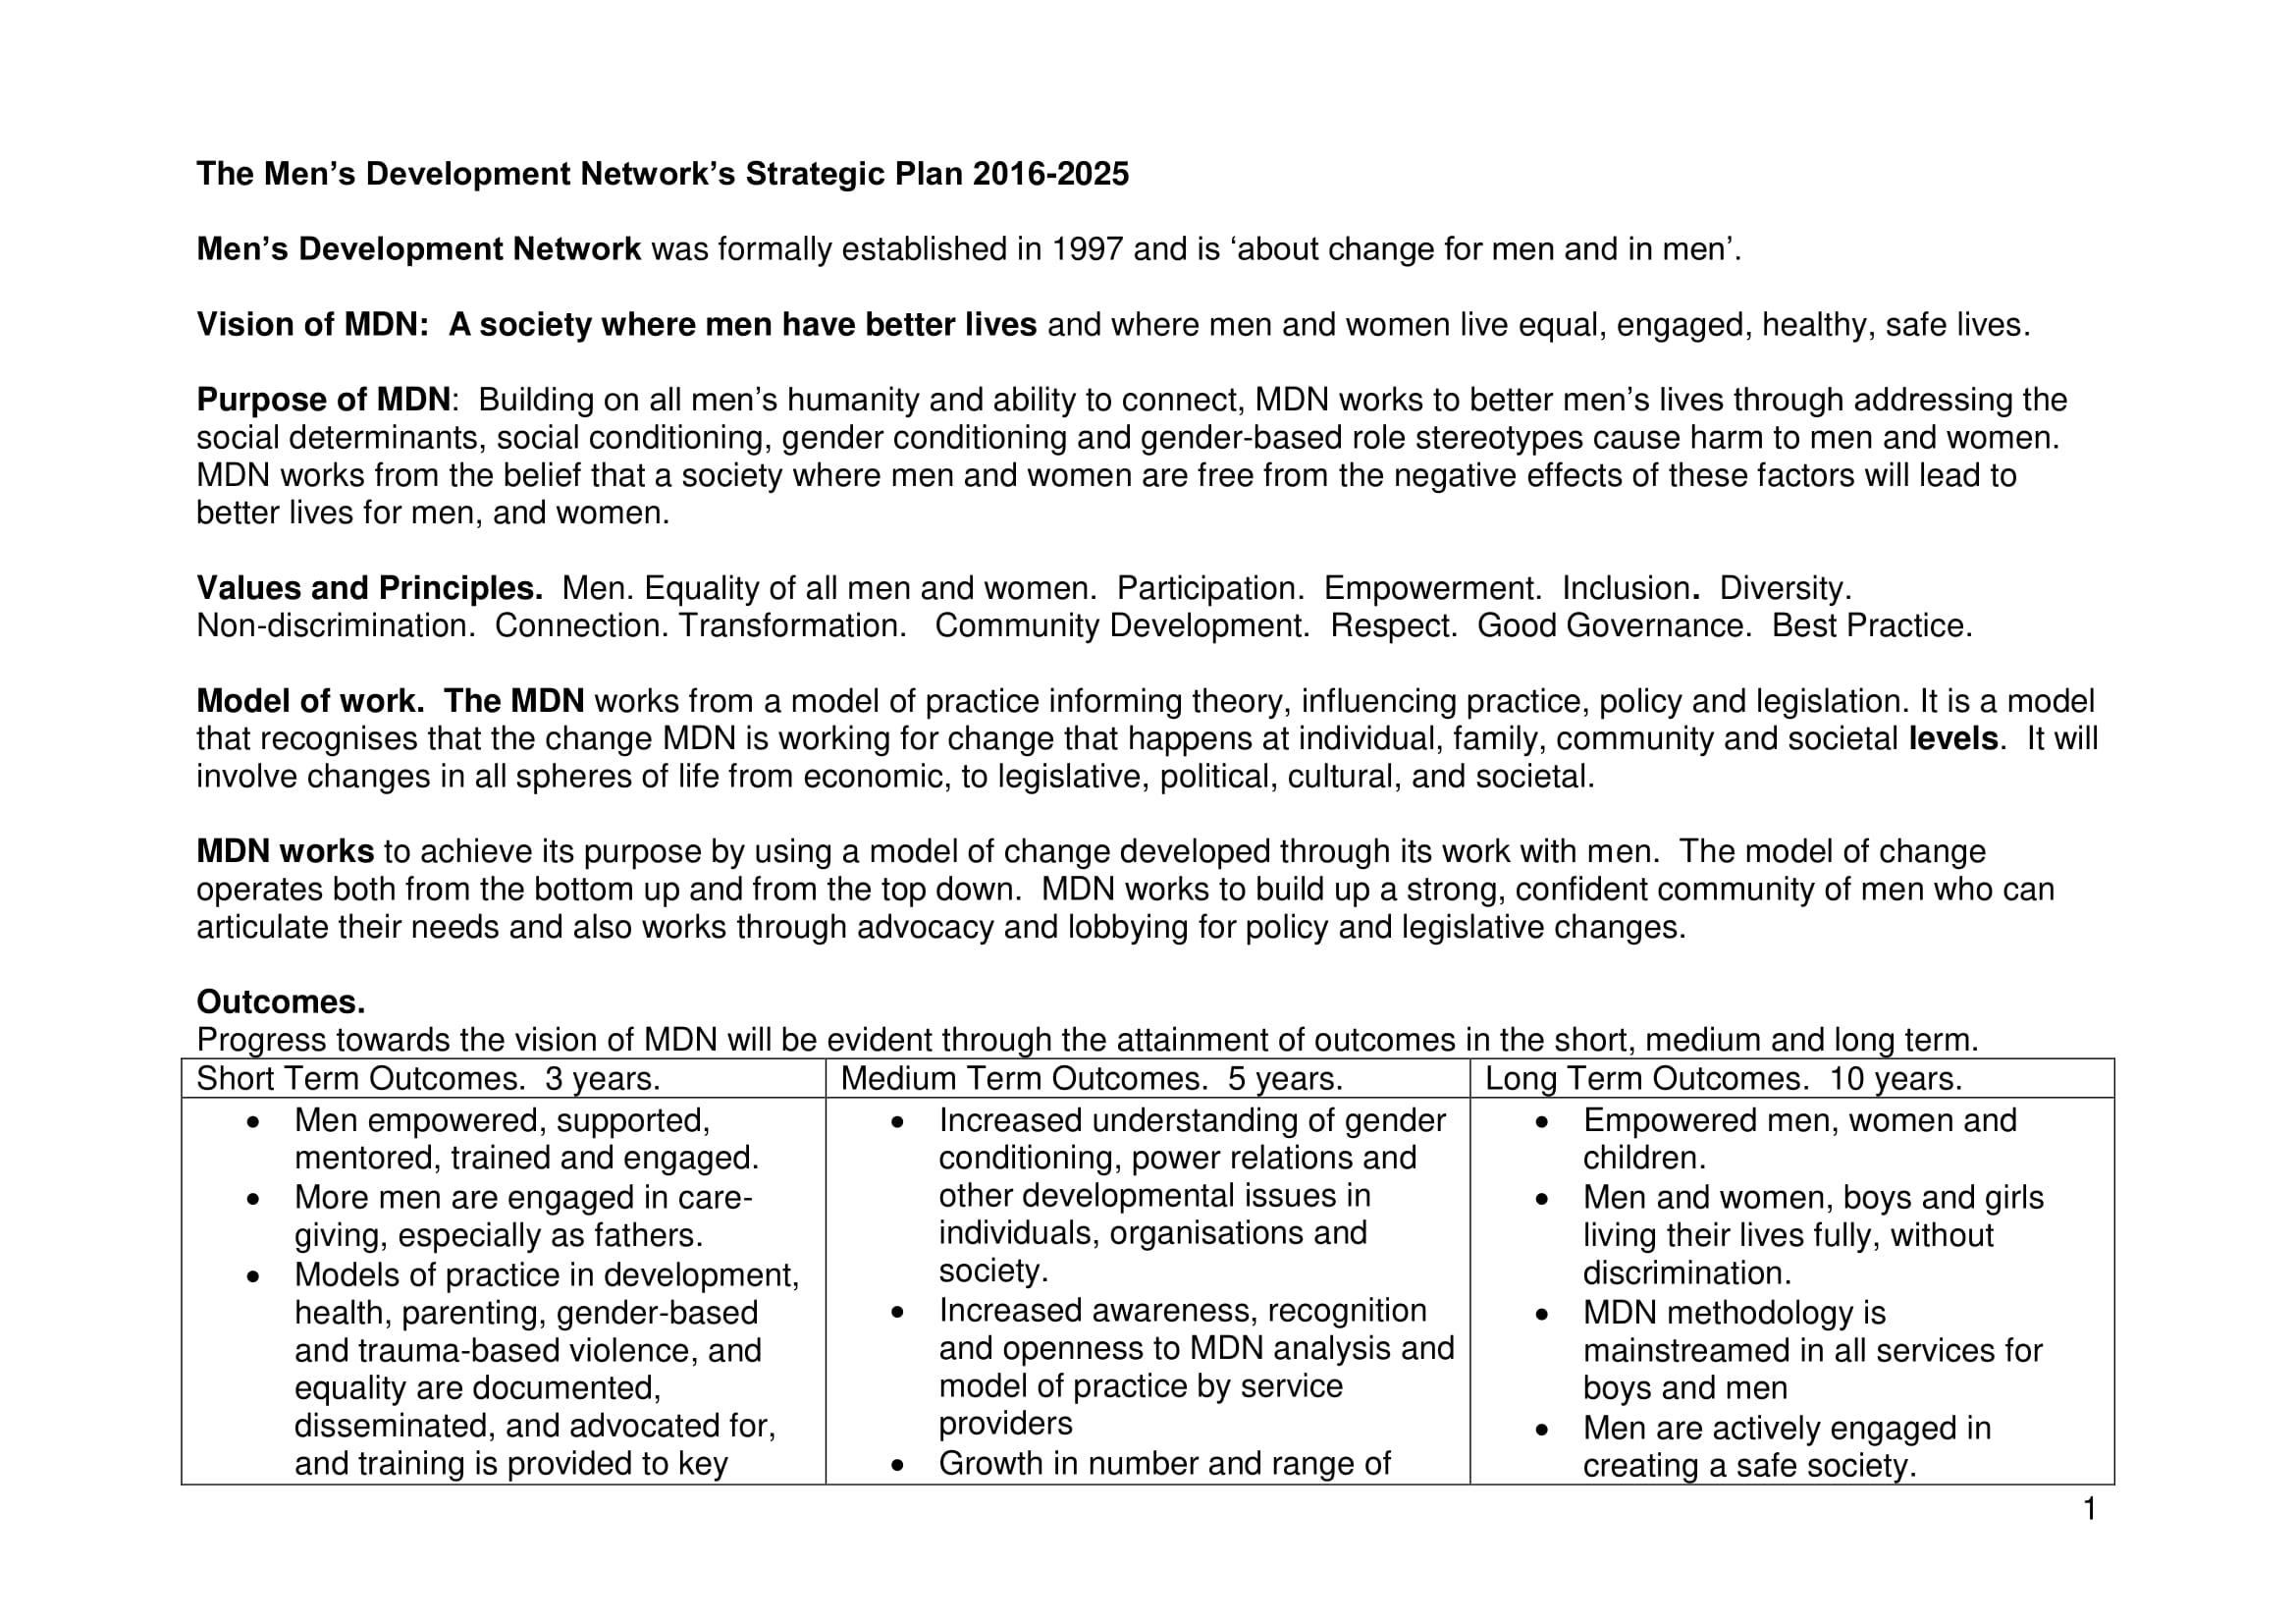 men's development network's strategic plan example